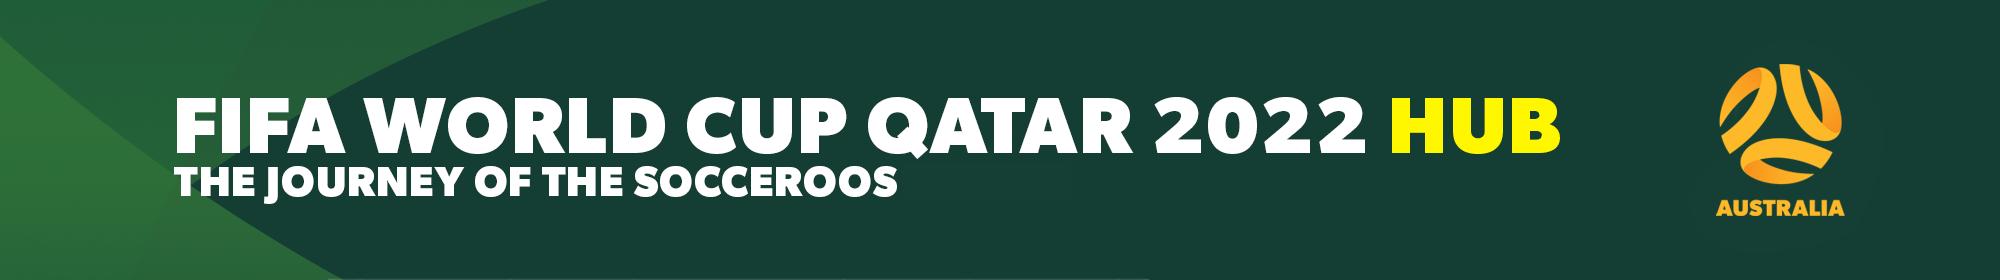 Socceroos Qatar Hub